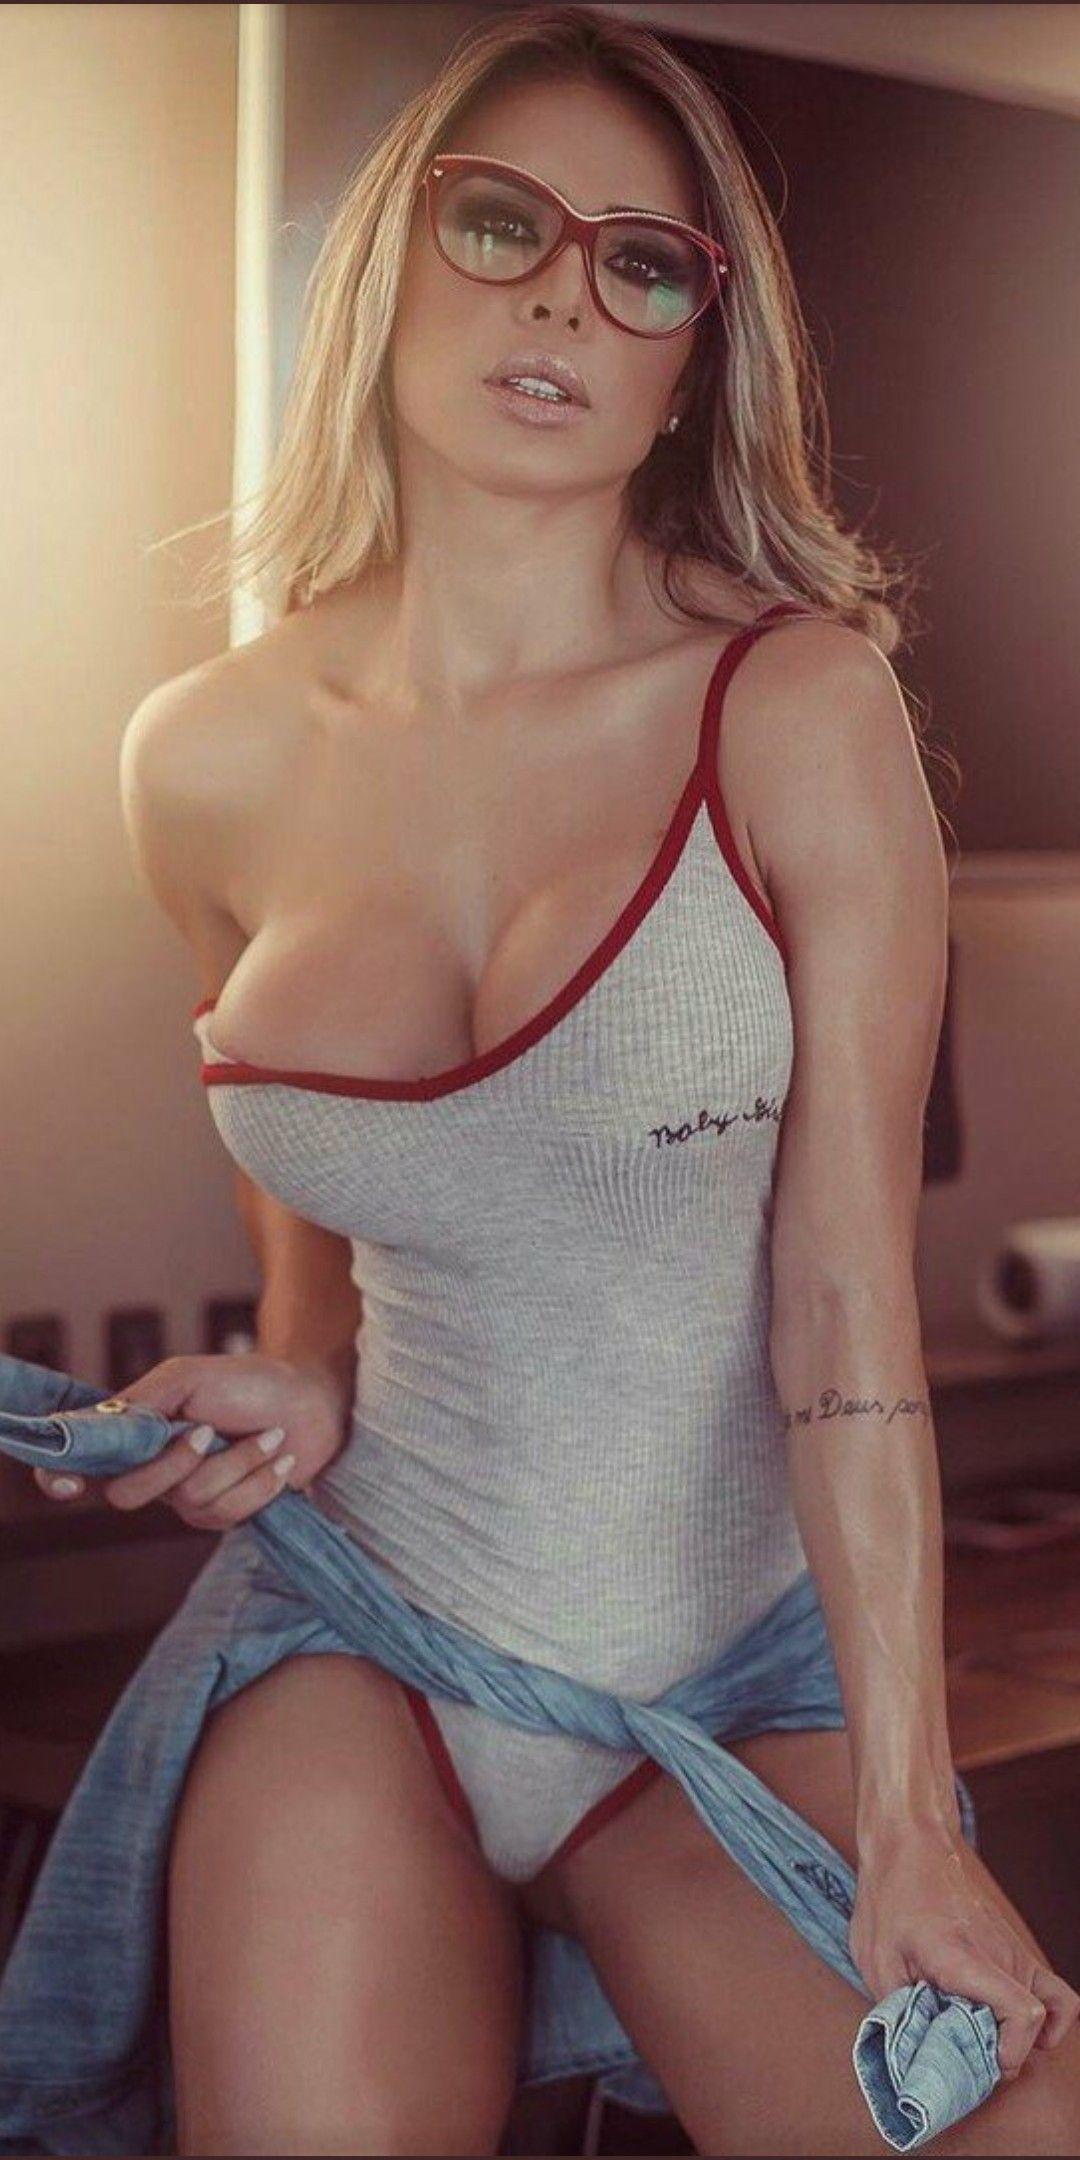 Nude photos of europian girls